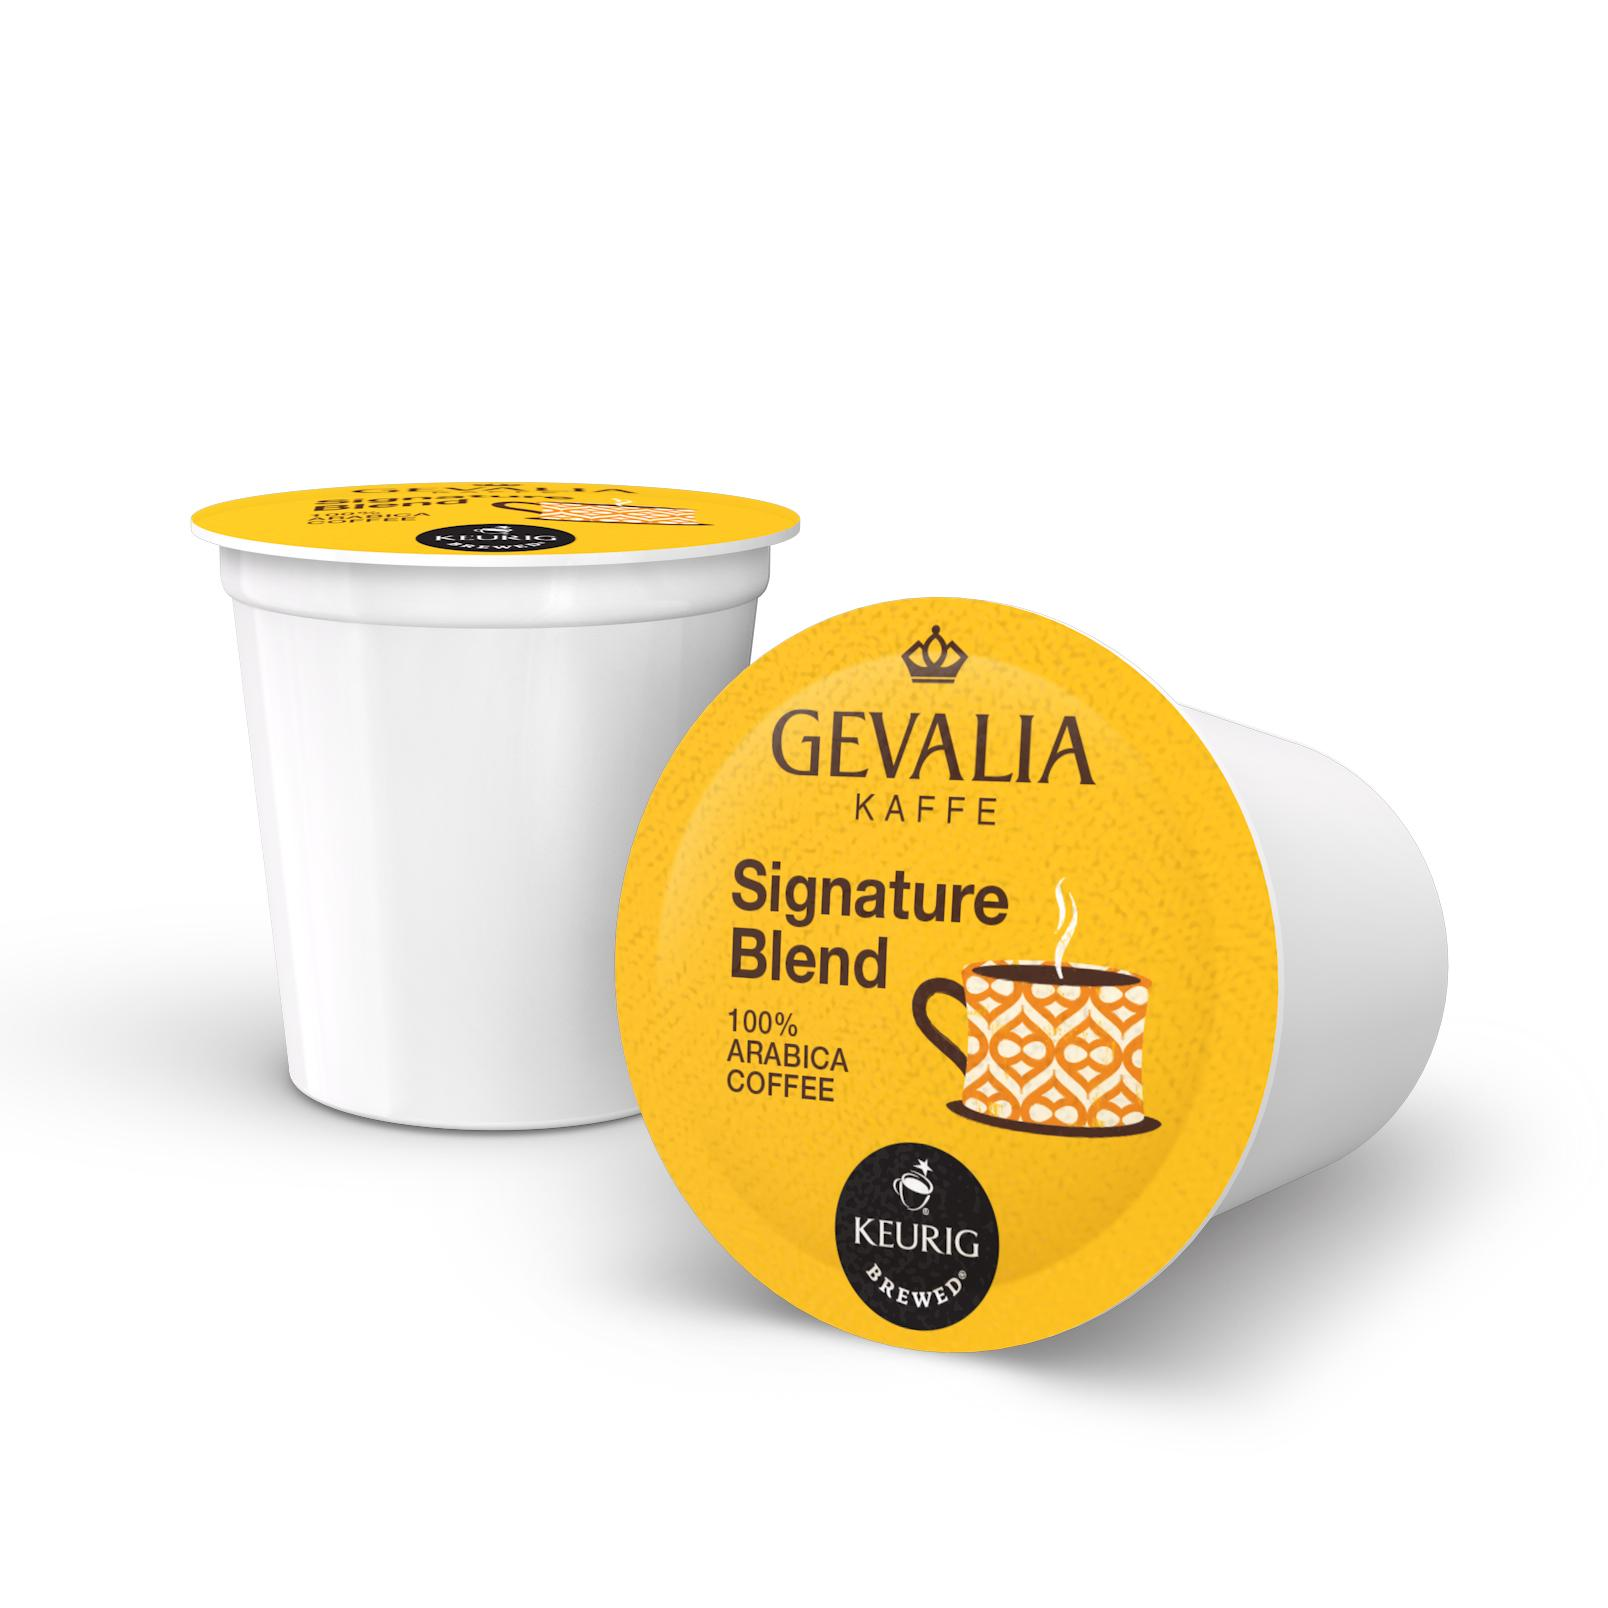 Amazon.com : GEVALIA Kaffe Signature Blend K-CUP Pods - 12 count : Coffee Brewing Machine Cups ...